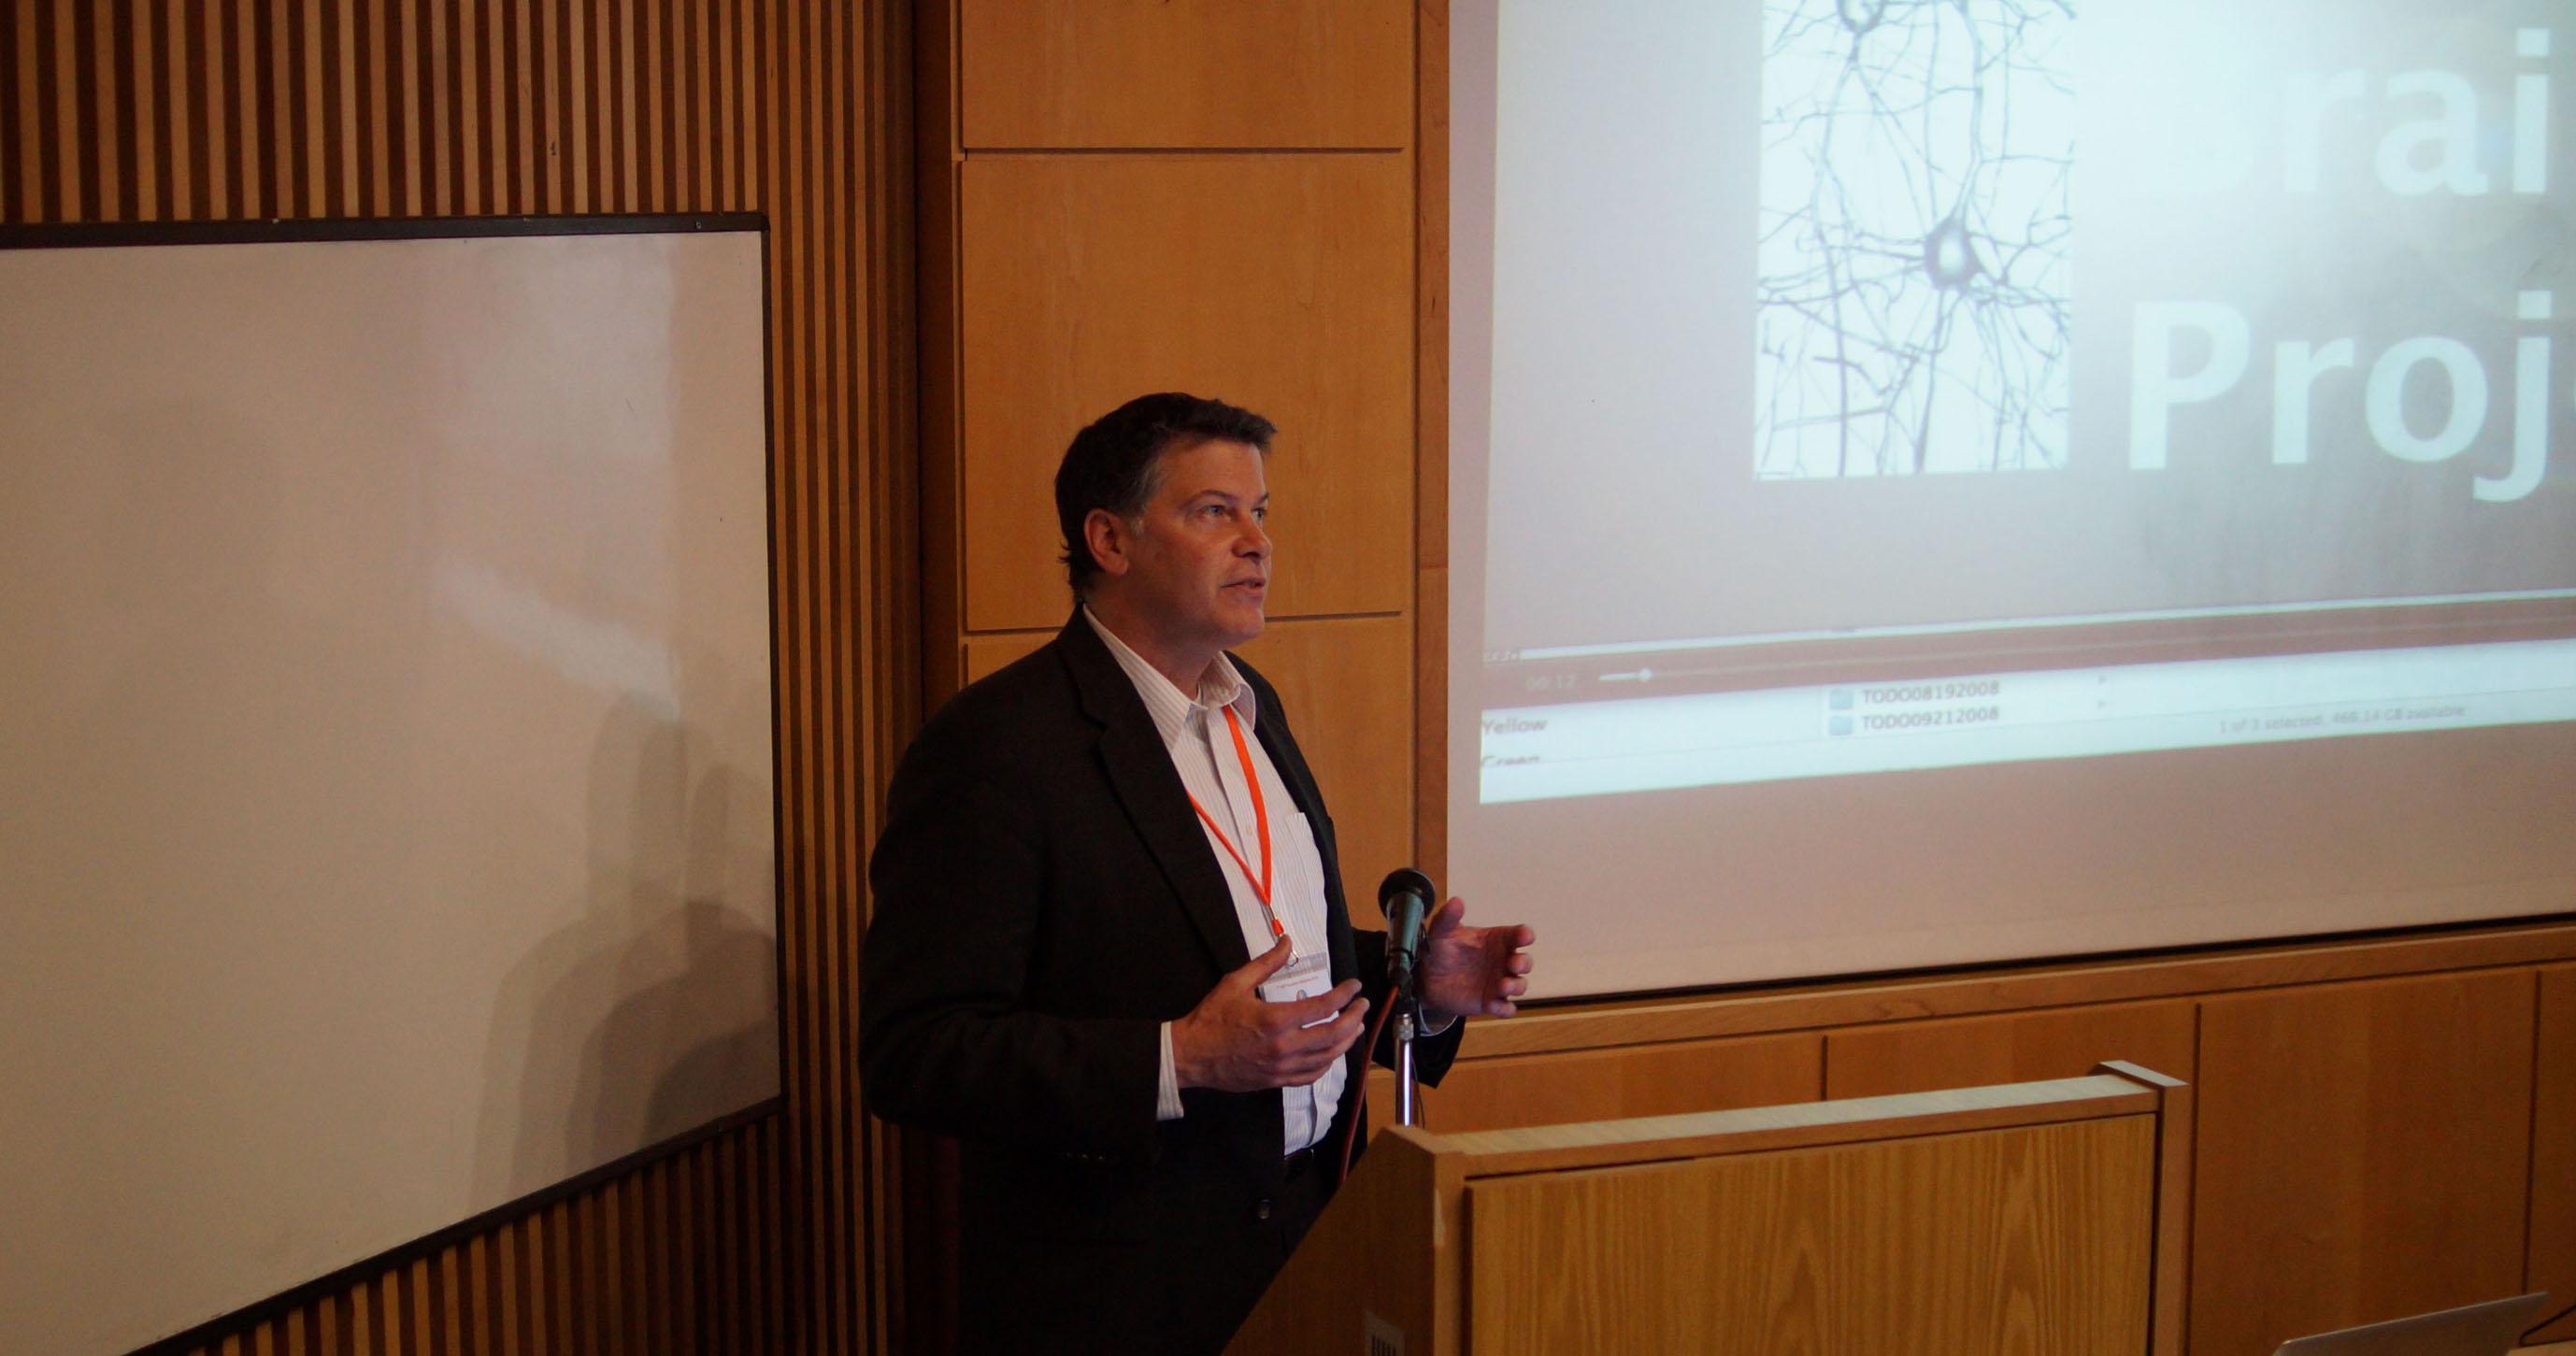 David Horrigan - Neuroscience education, the future - online tools and public involvement -